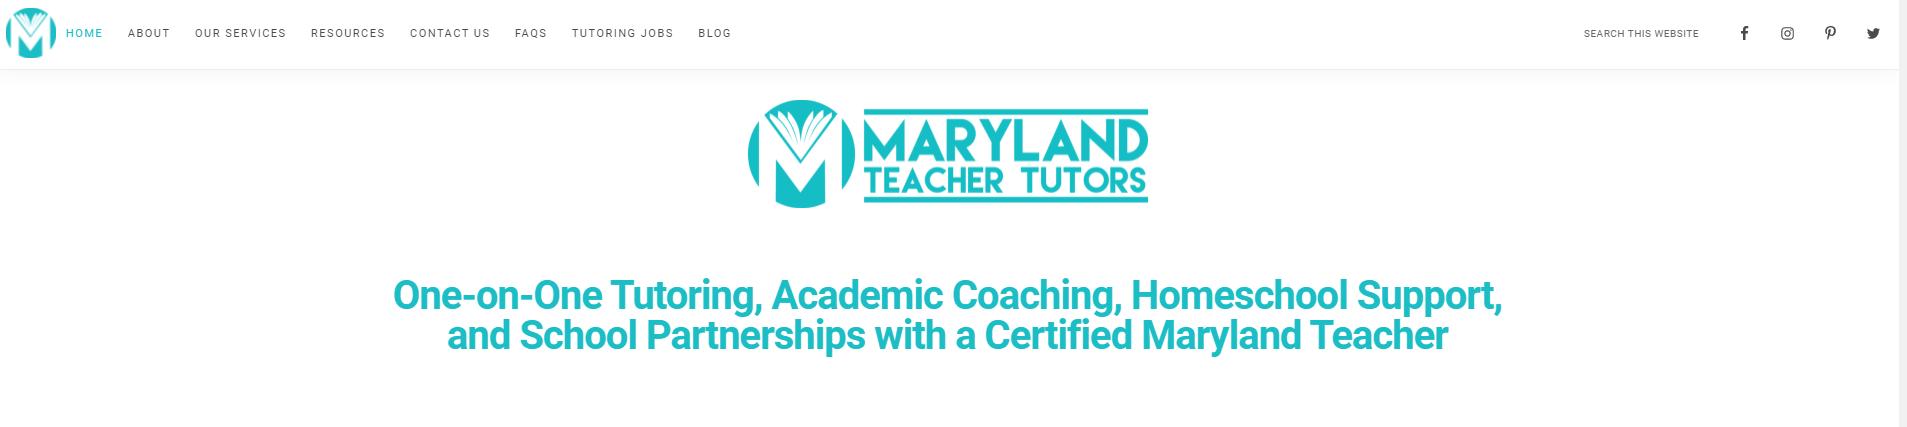 Maryland Teacher Tutors